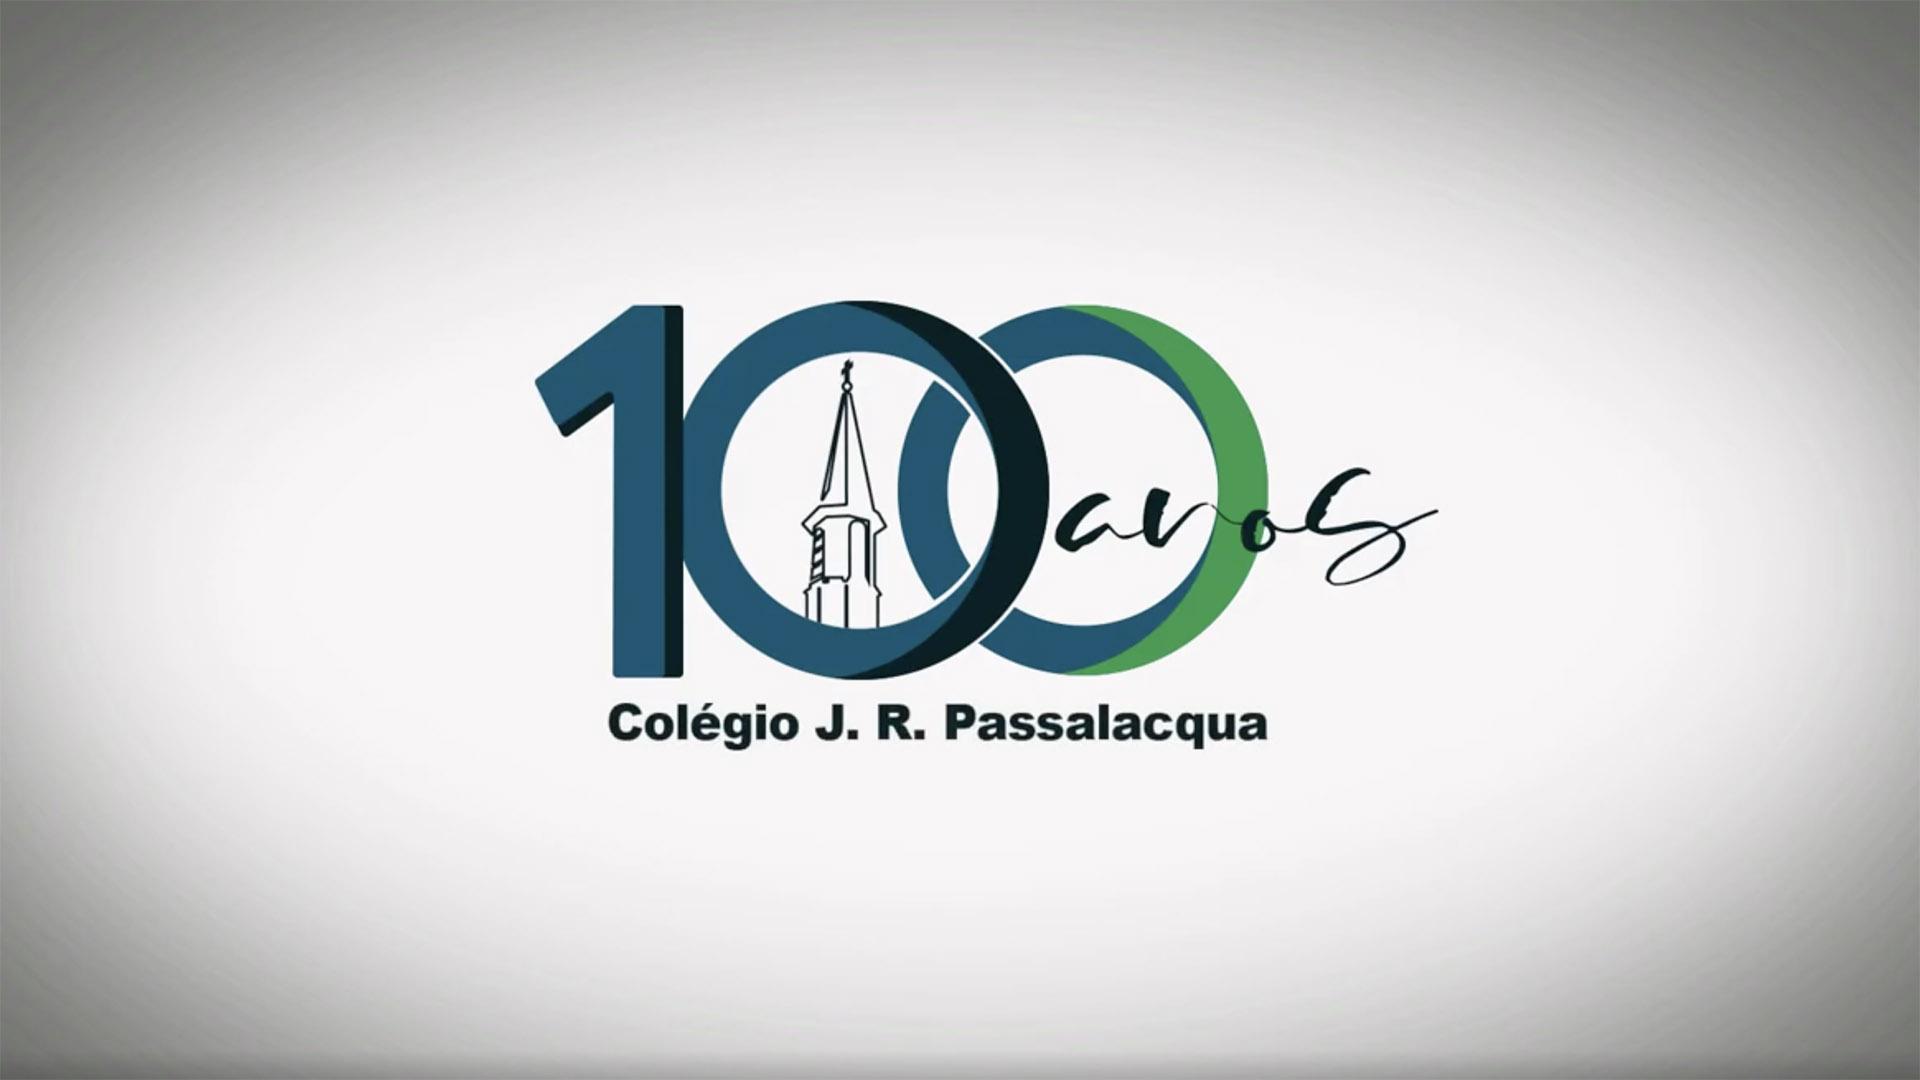 [Colégio JR Passalacqua - 100 anos]